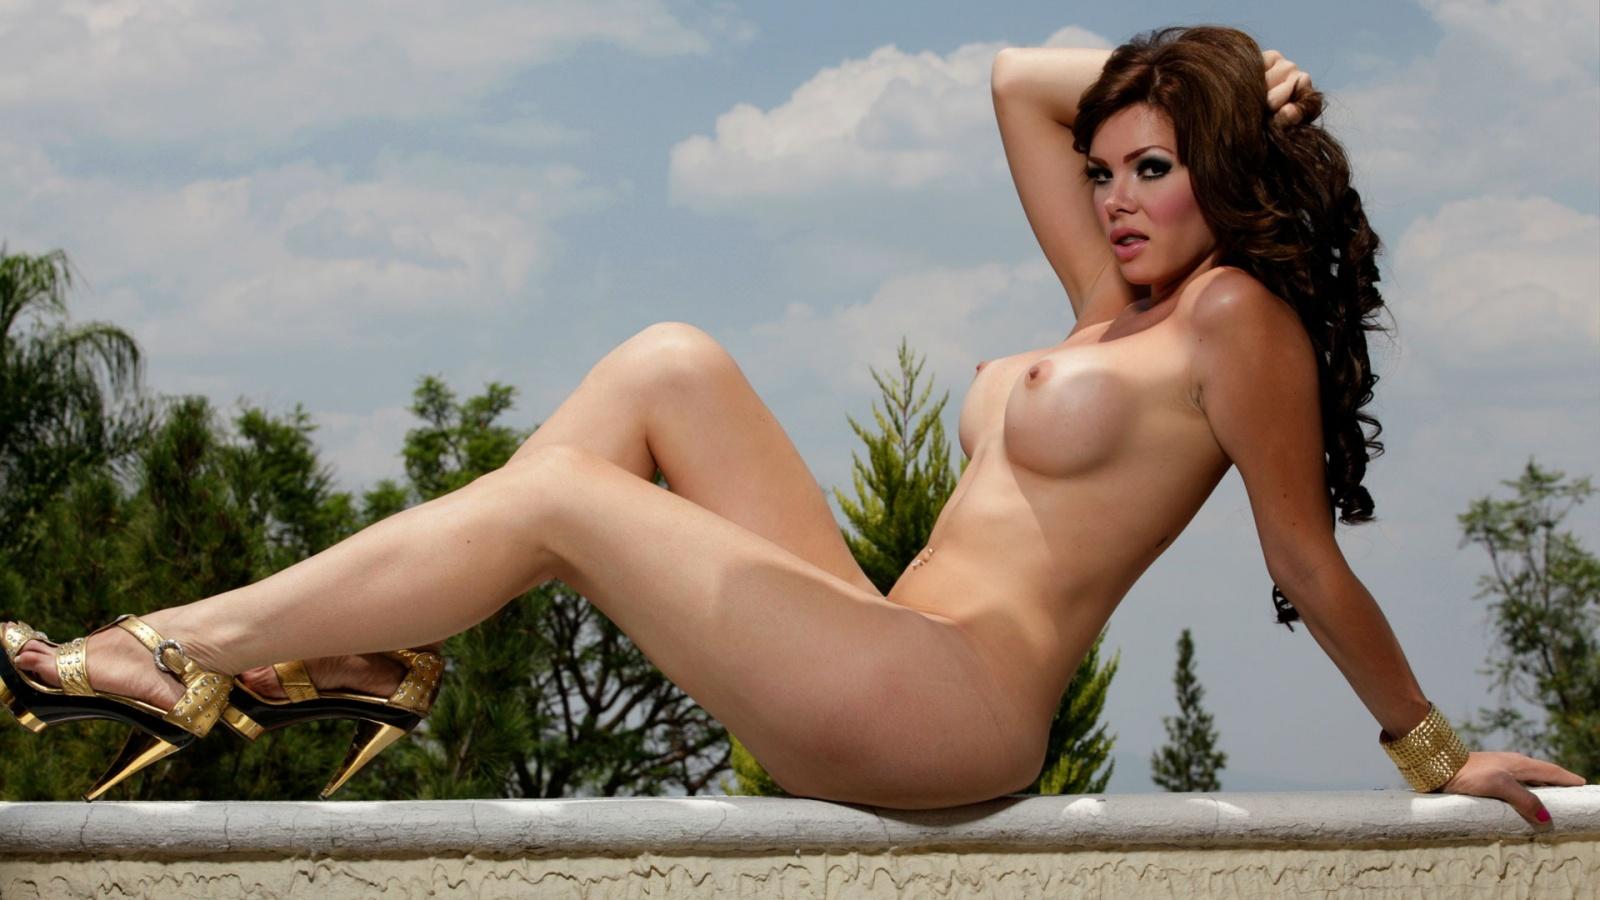 Naked shemale wallpaper nackt photos